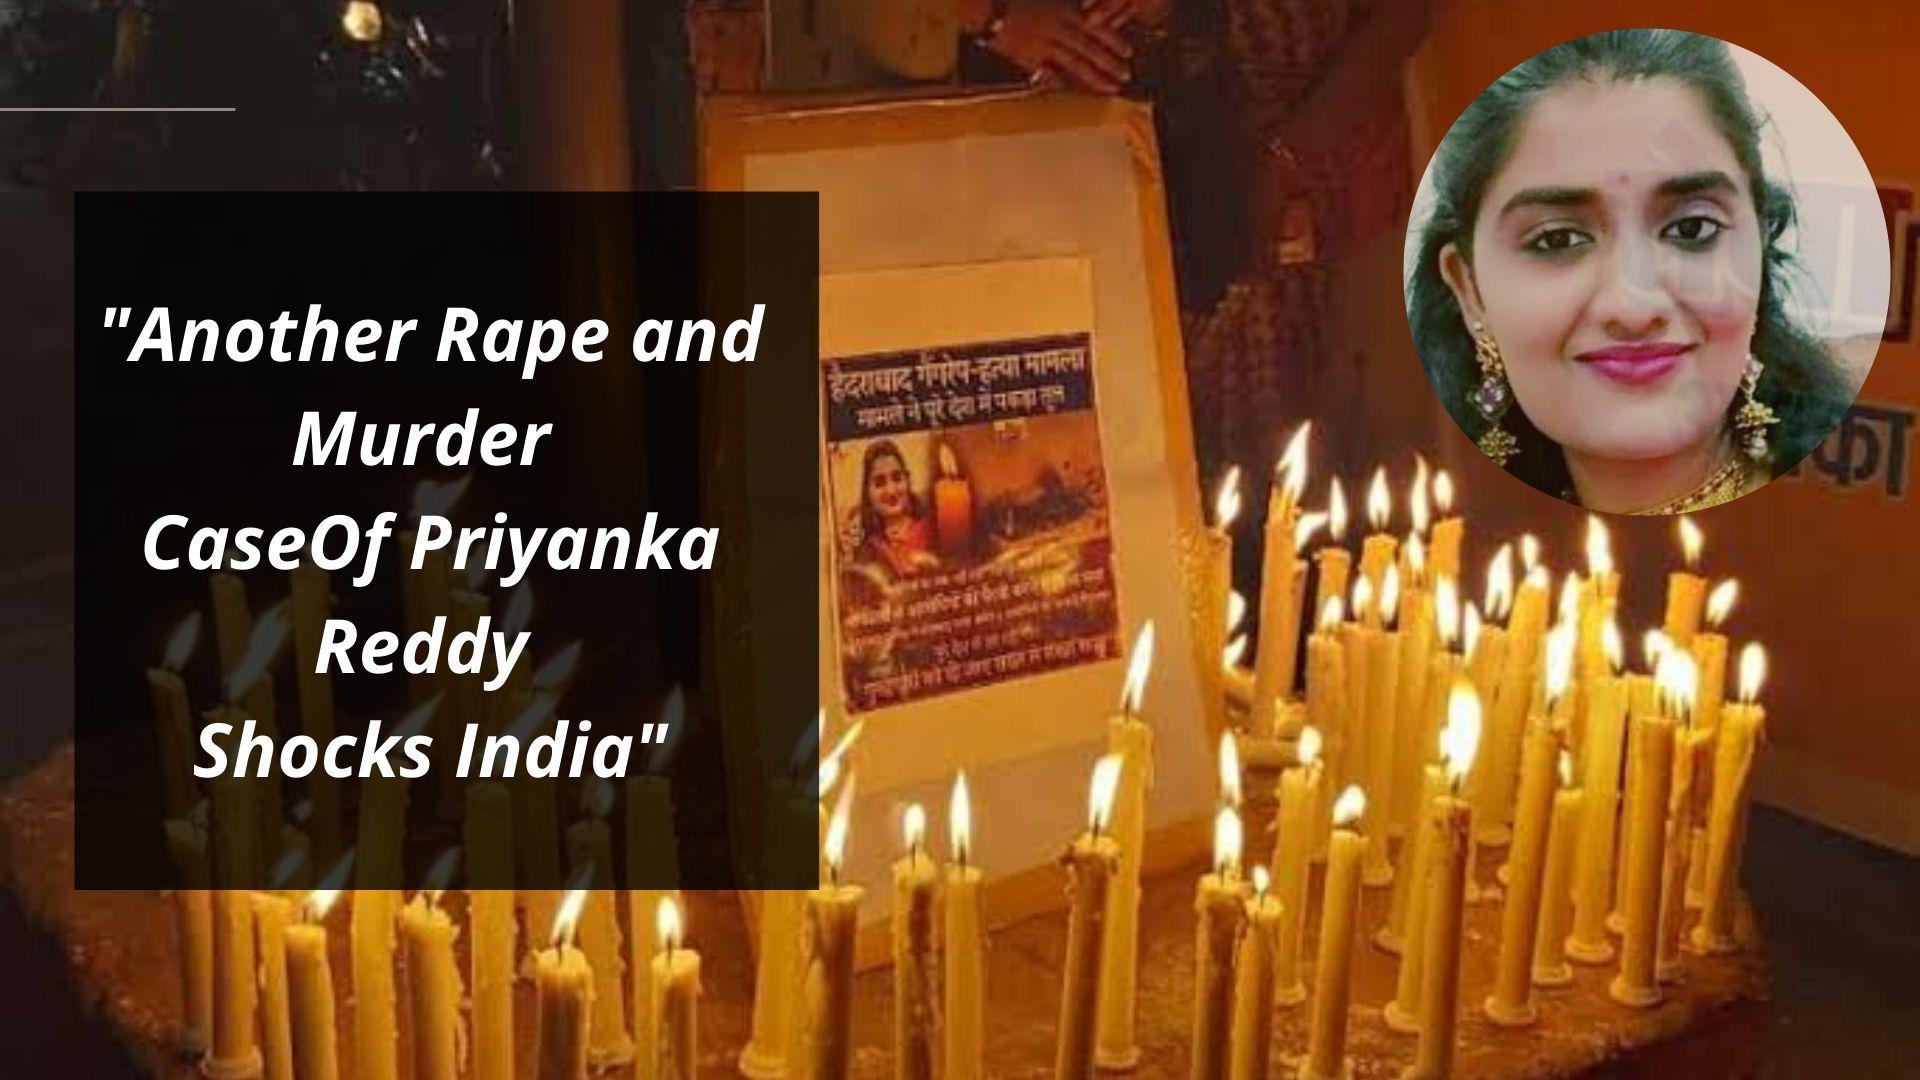 Another Rape and Murder Case Of Priyanka Reddy Shocks India